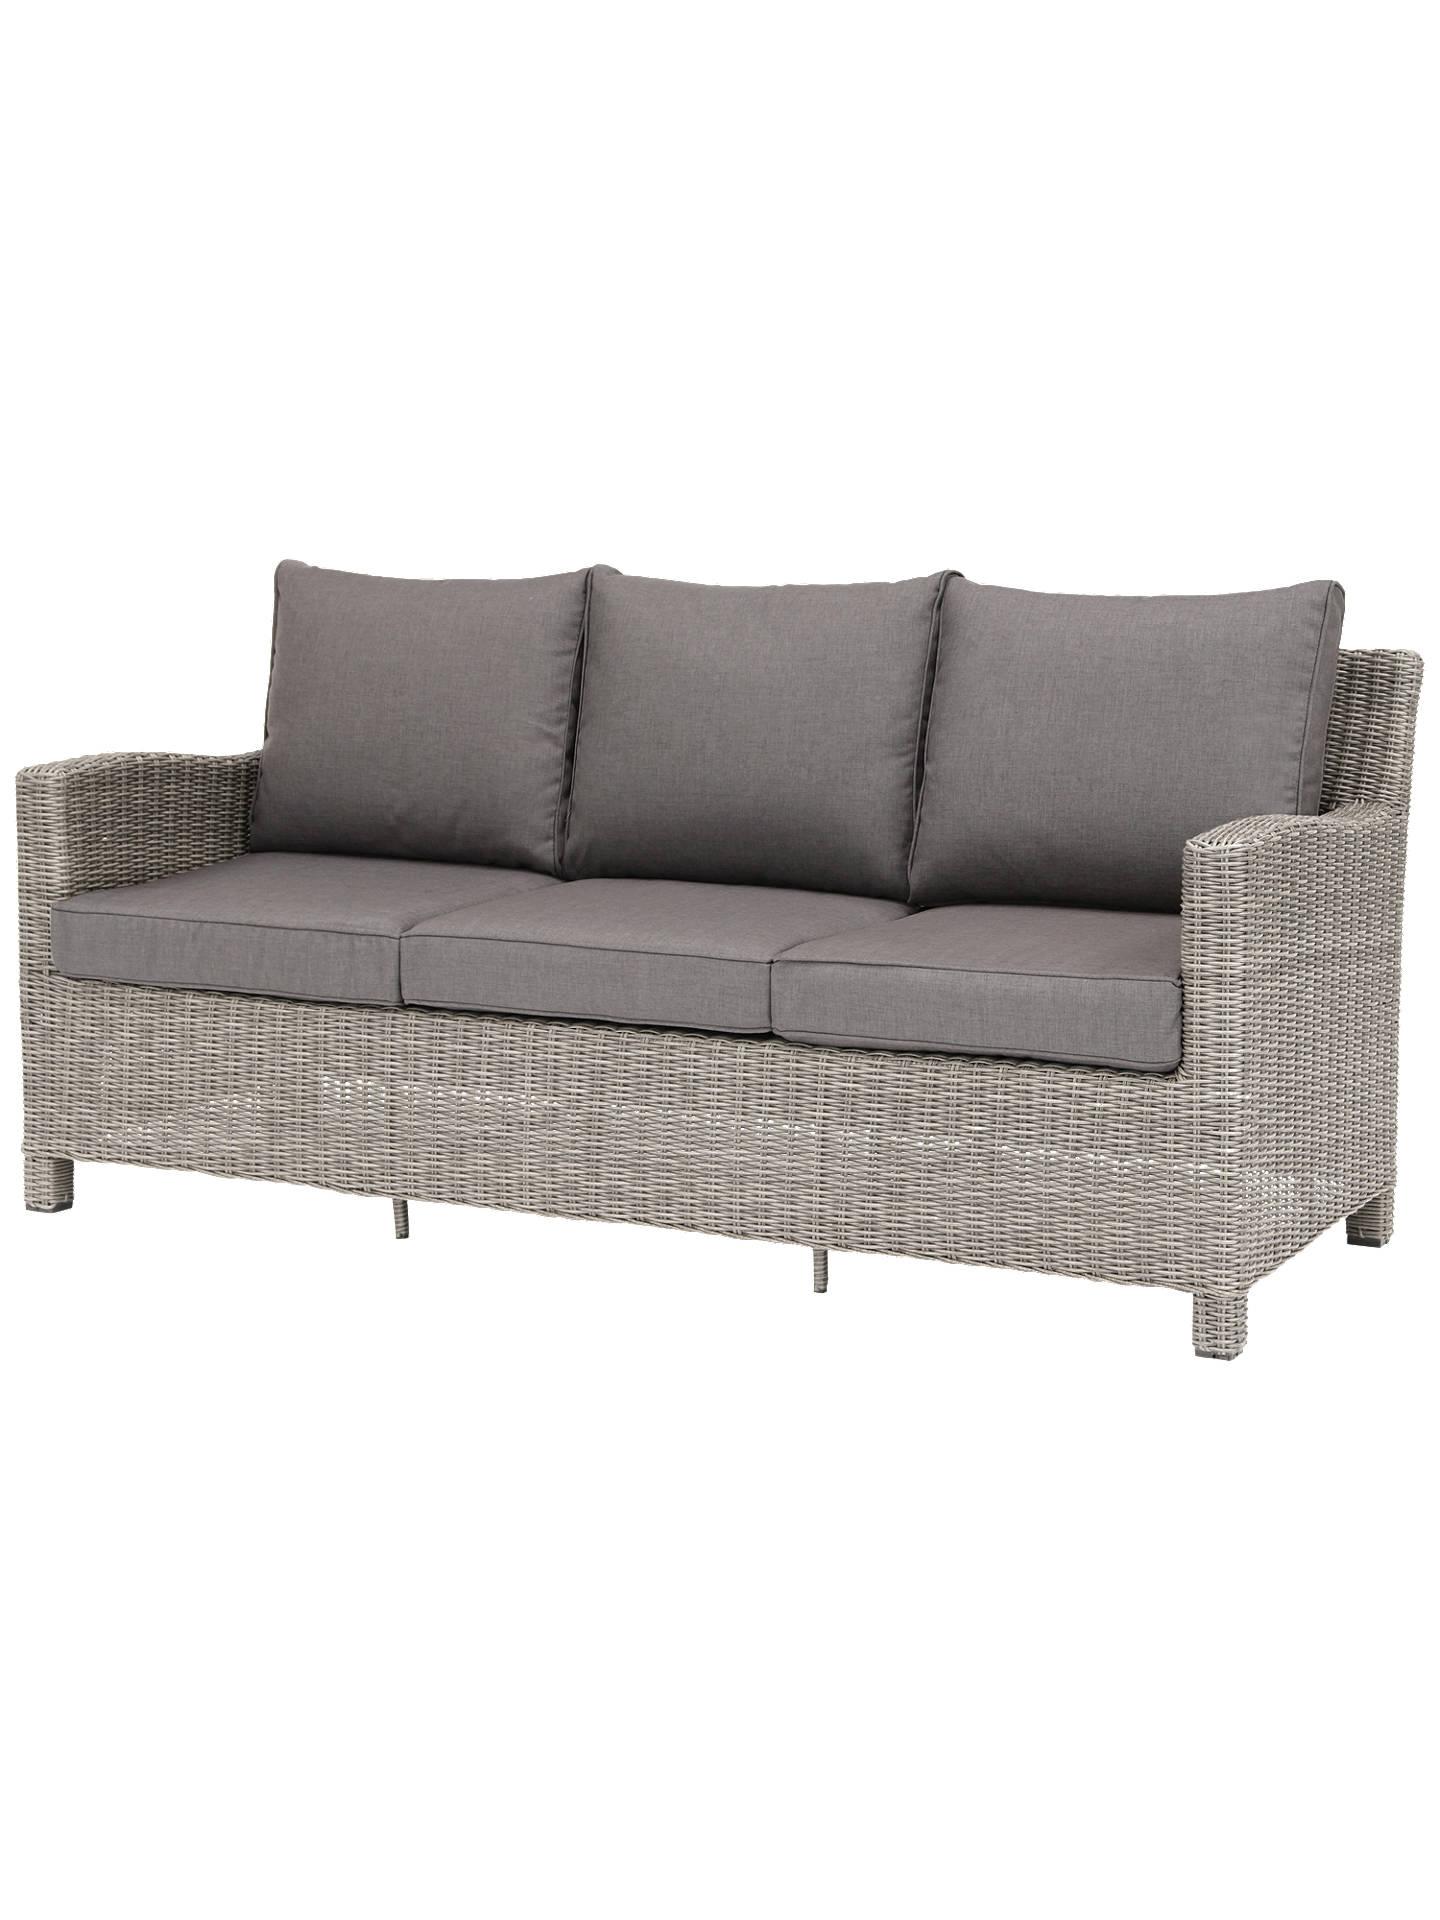 Sofa Palma Nkde Kettler Palma 3 Seater Garden sofa at John Lewis Partners